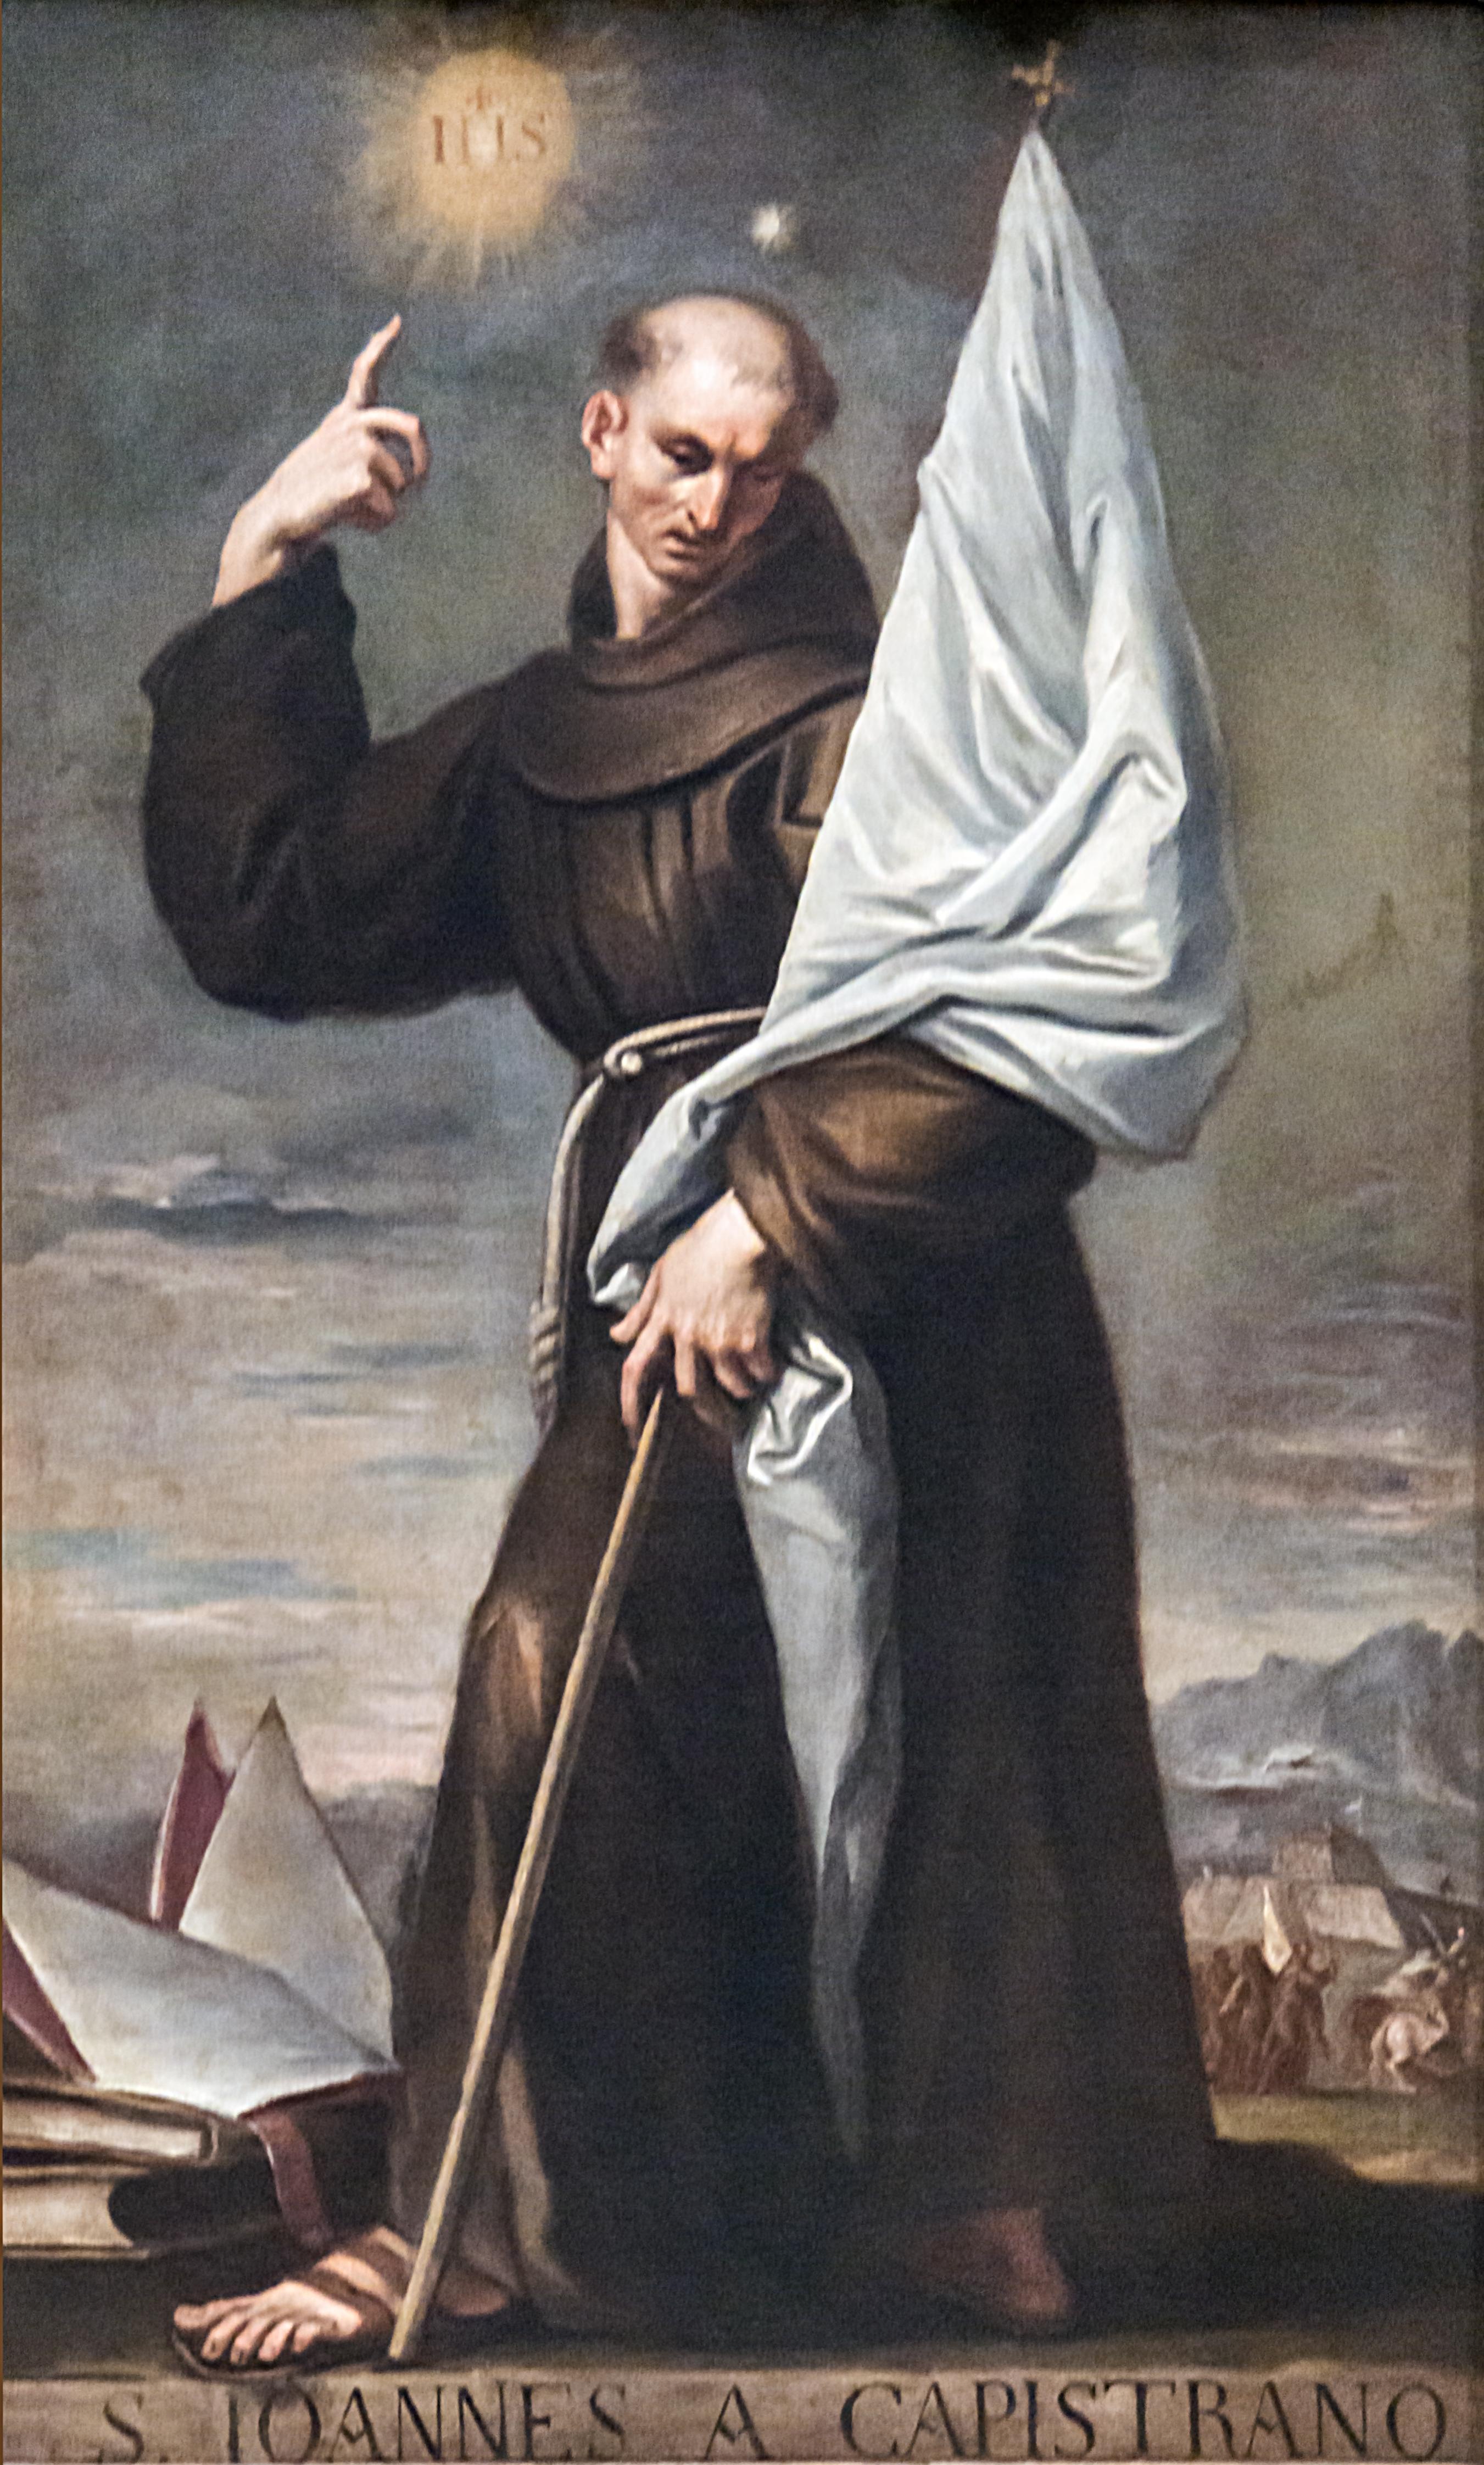 https://upload.wikimedia.org/wikipedia/commons/4/4c/Interior_of_San_Francesco_della_Vigna_%28Venice%29_Sacristy_-_John_of_Capistrano_by_Nicola_Grassi.jpg